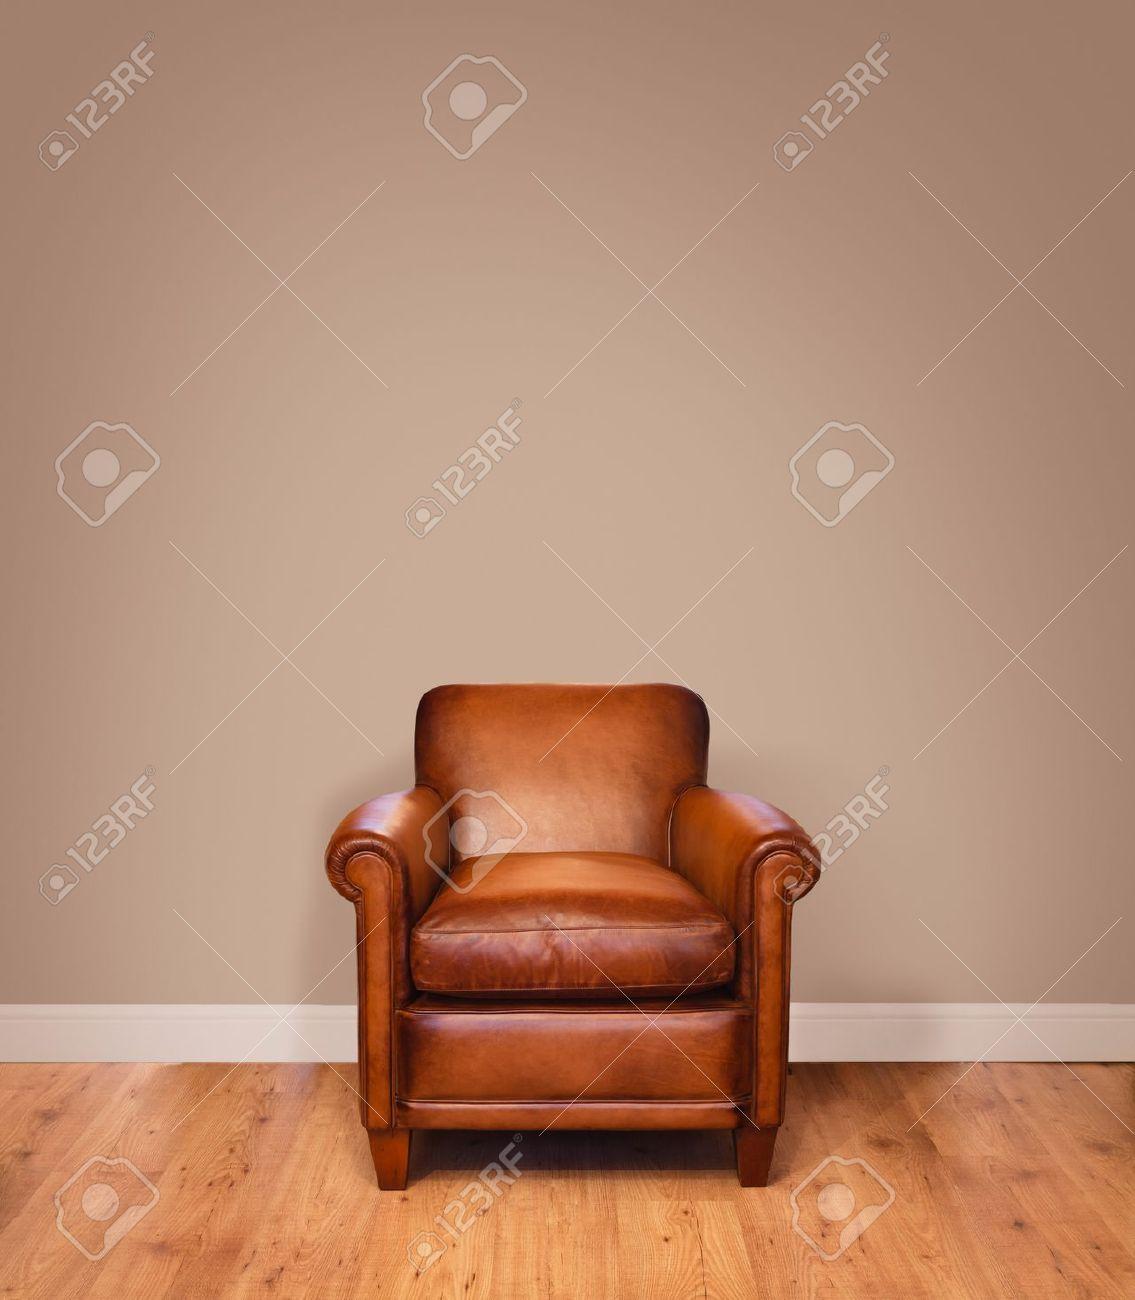 Leather armchair on a wooden floor against a plain background ...